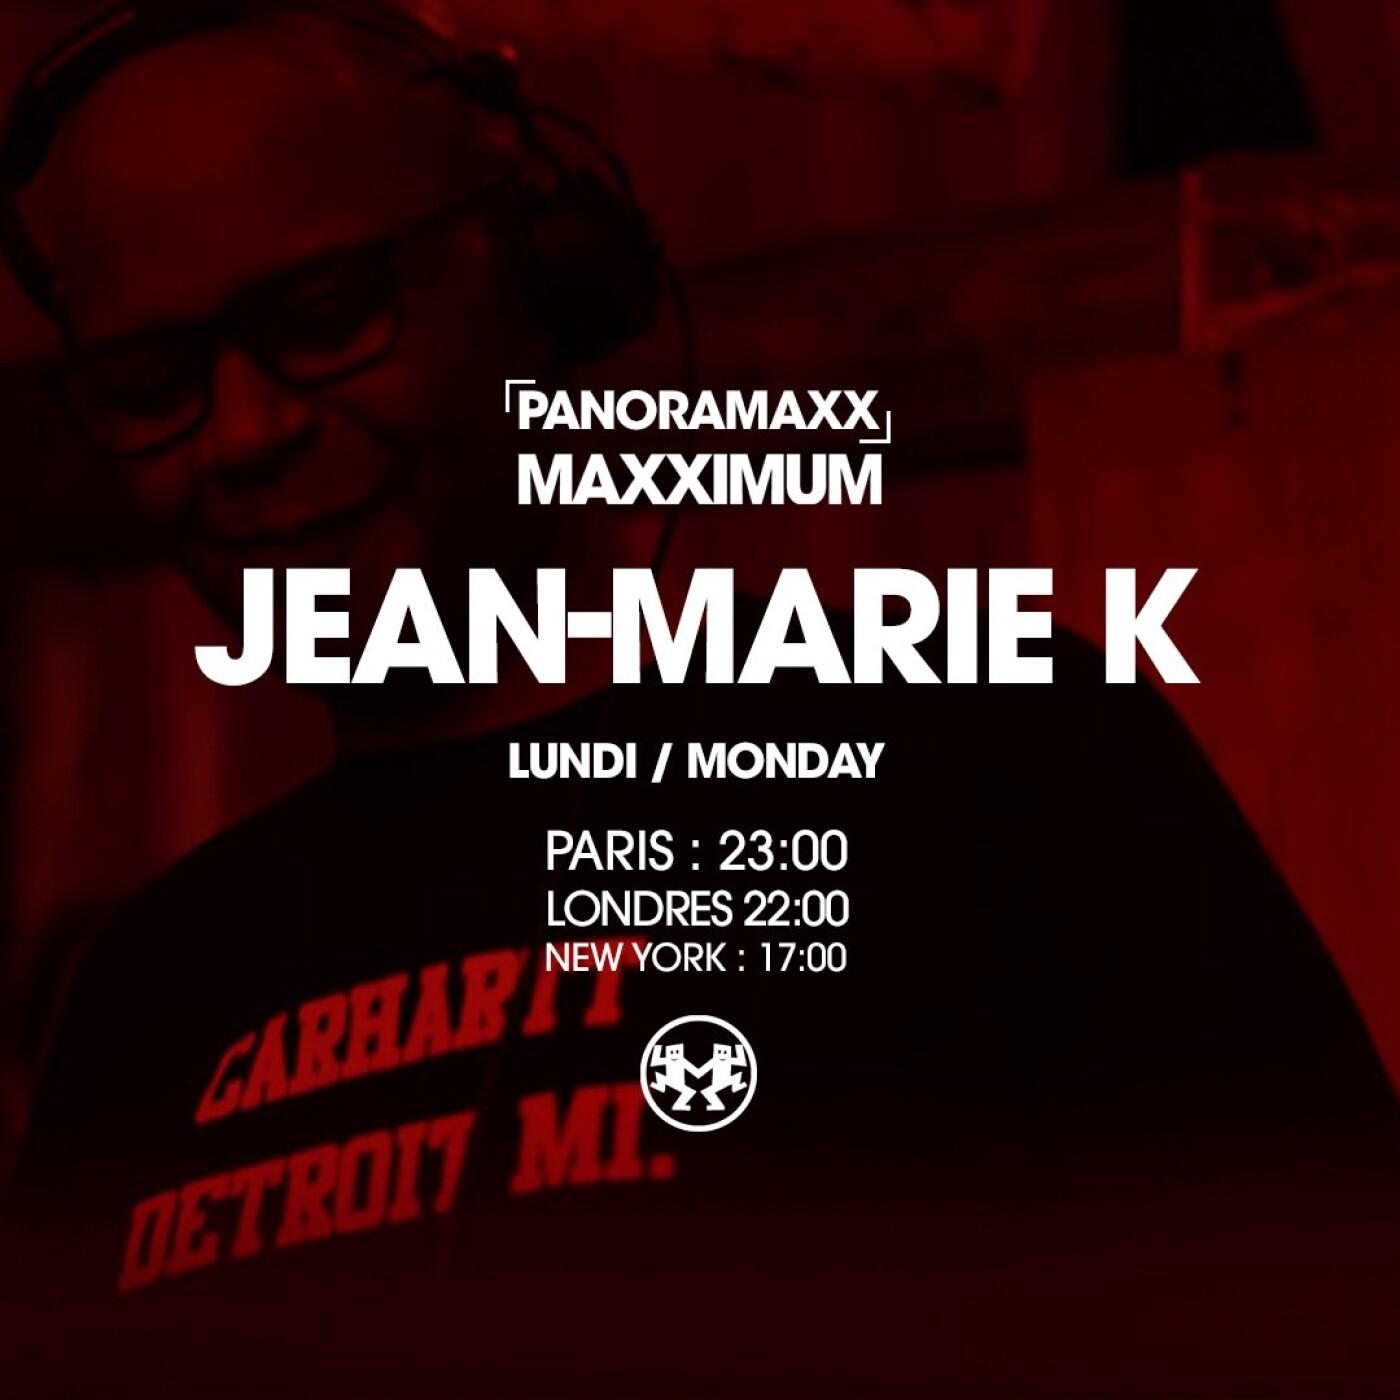 PANORAMAXX : JEAN MARIE K